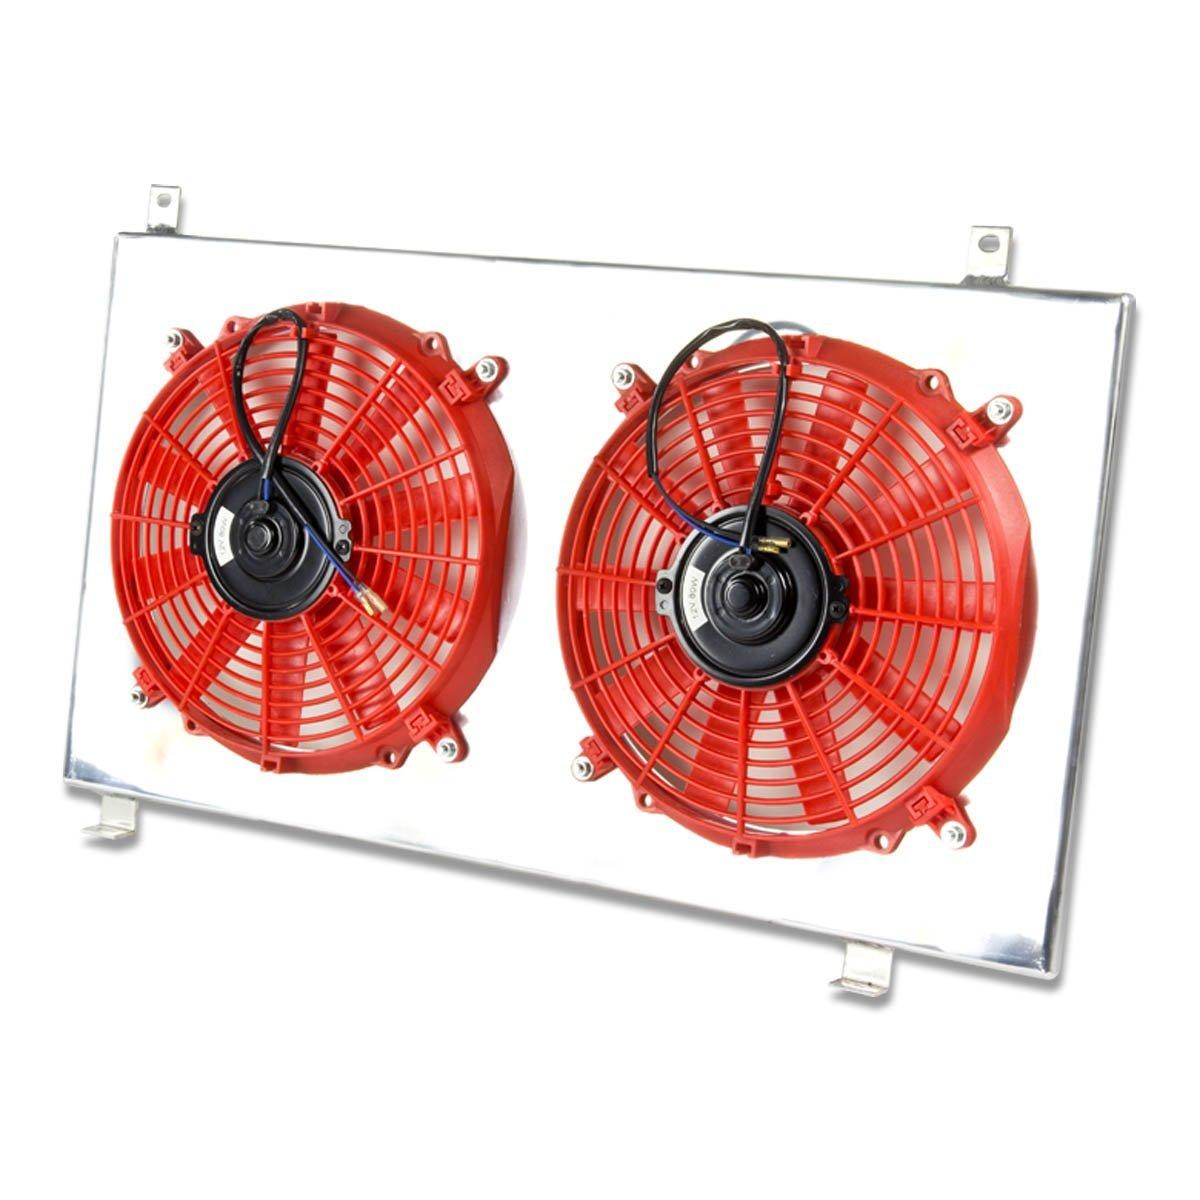 hight resolution of get quotations honda element mt aluminum bolt on cooling radiator fan shroud red y1